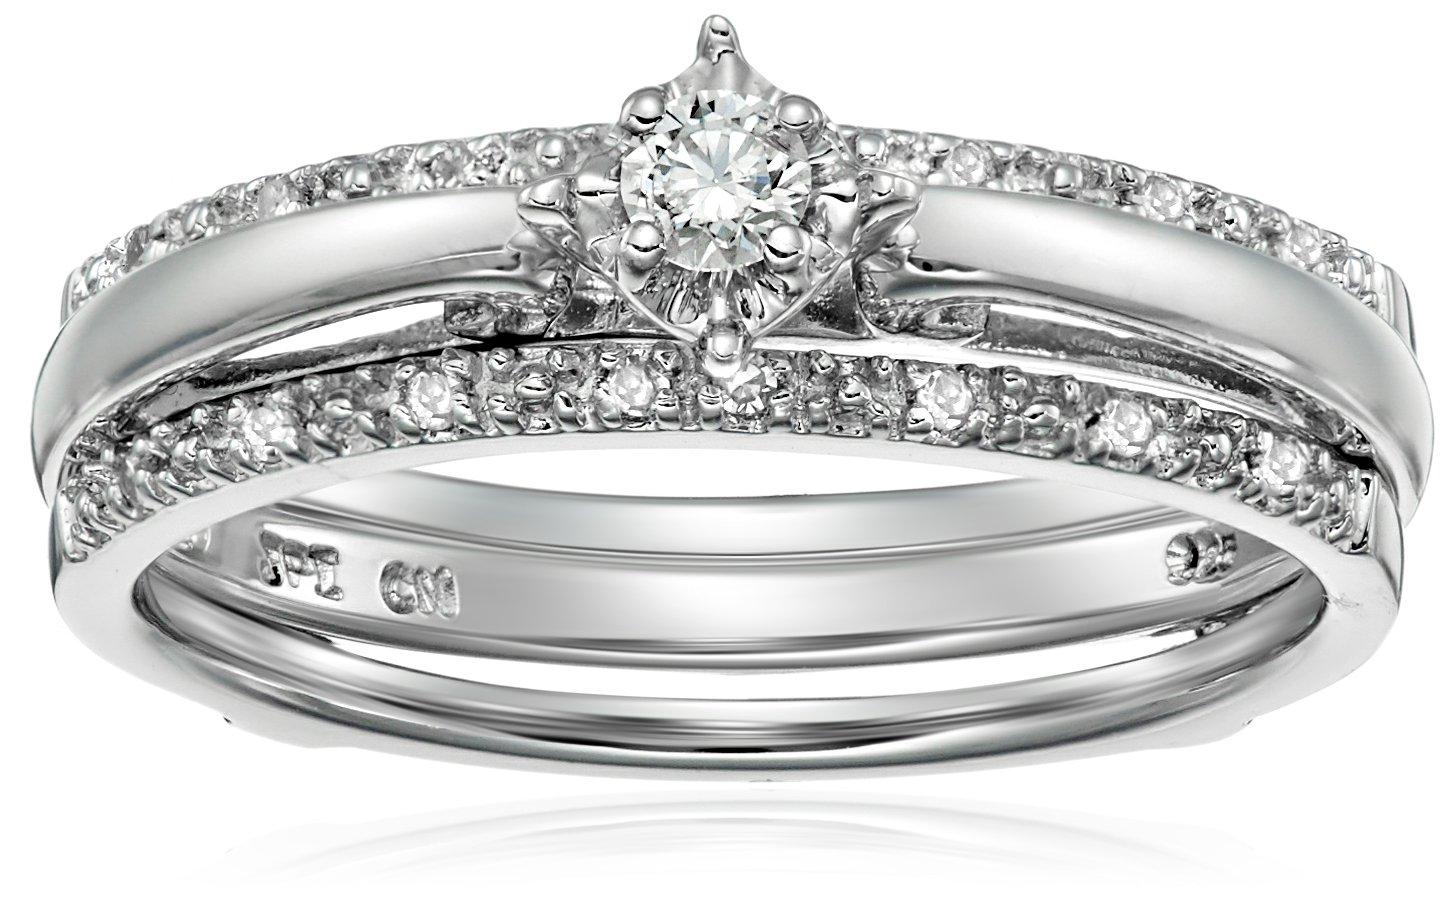 Sterling Silver Diamond Bridal Set (0.14 cttw, I-J Color, I2-I3 Clarity), Size 7